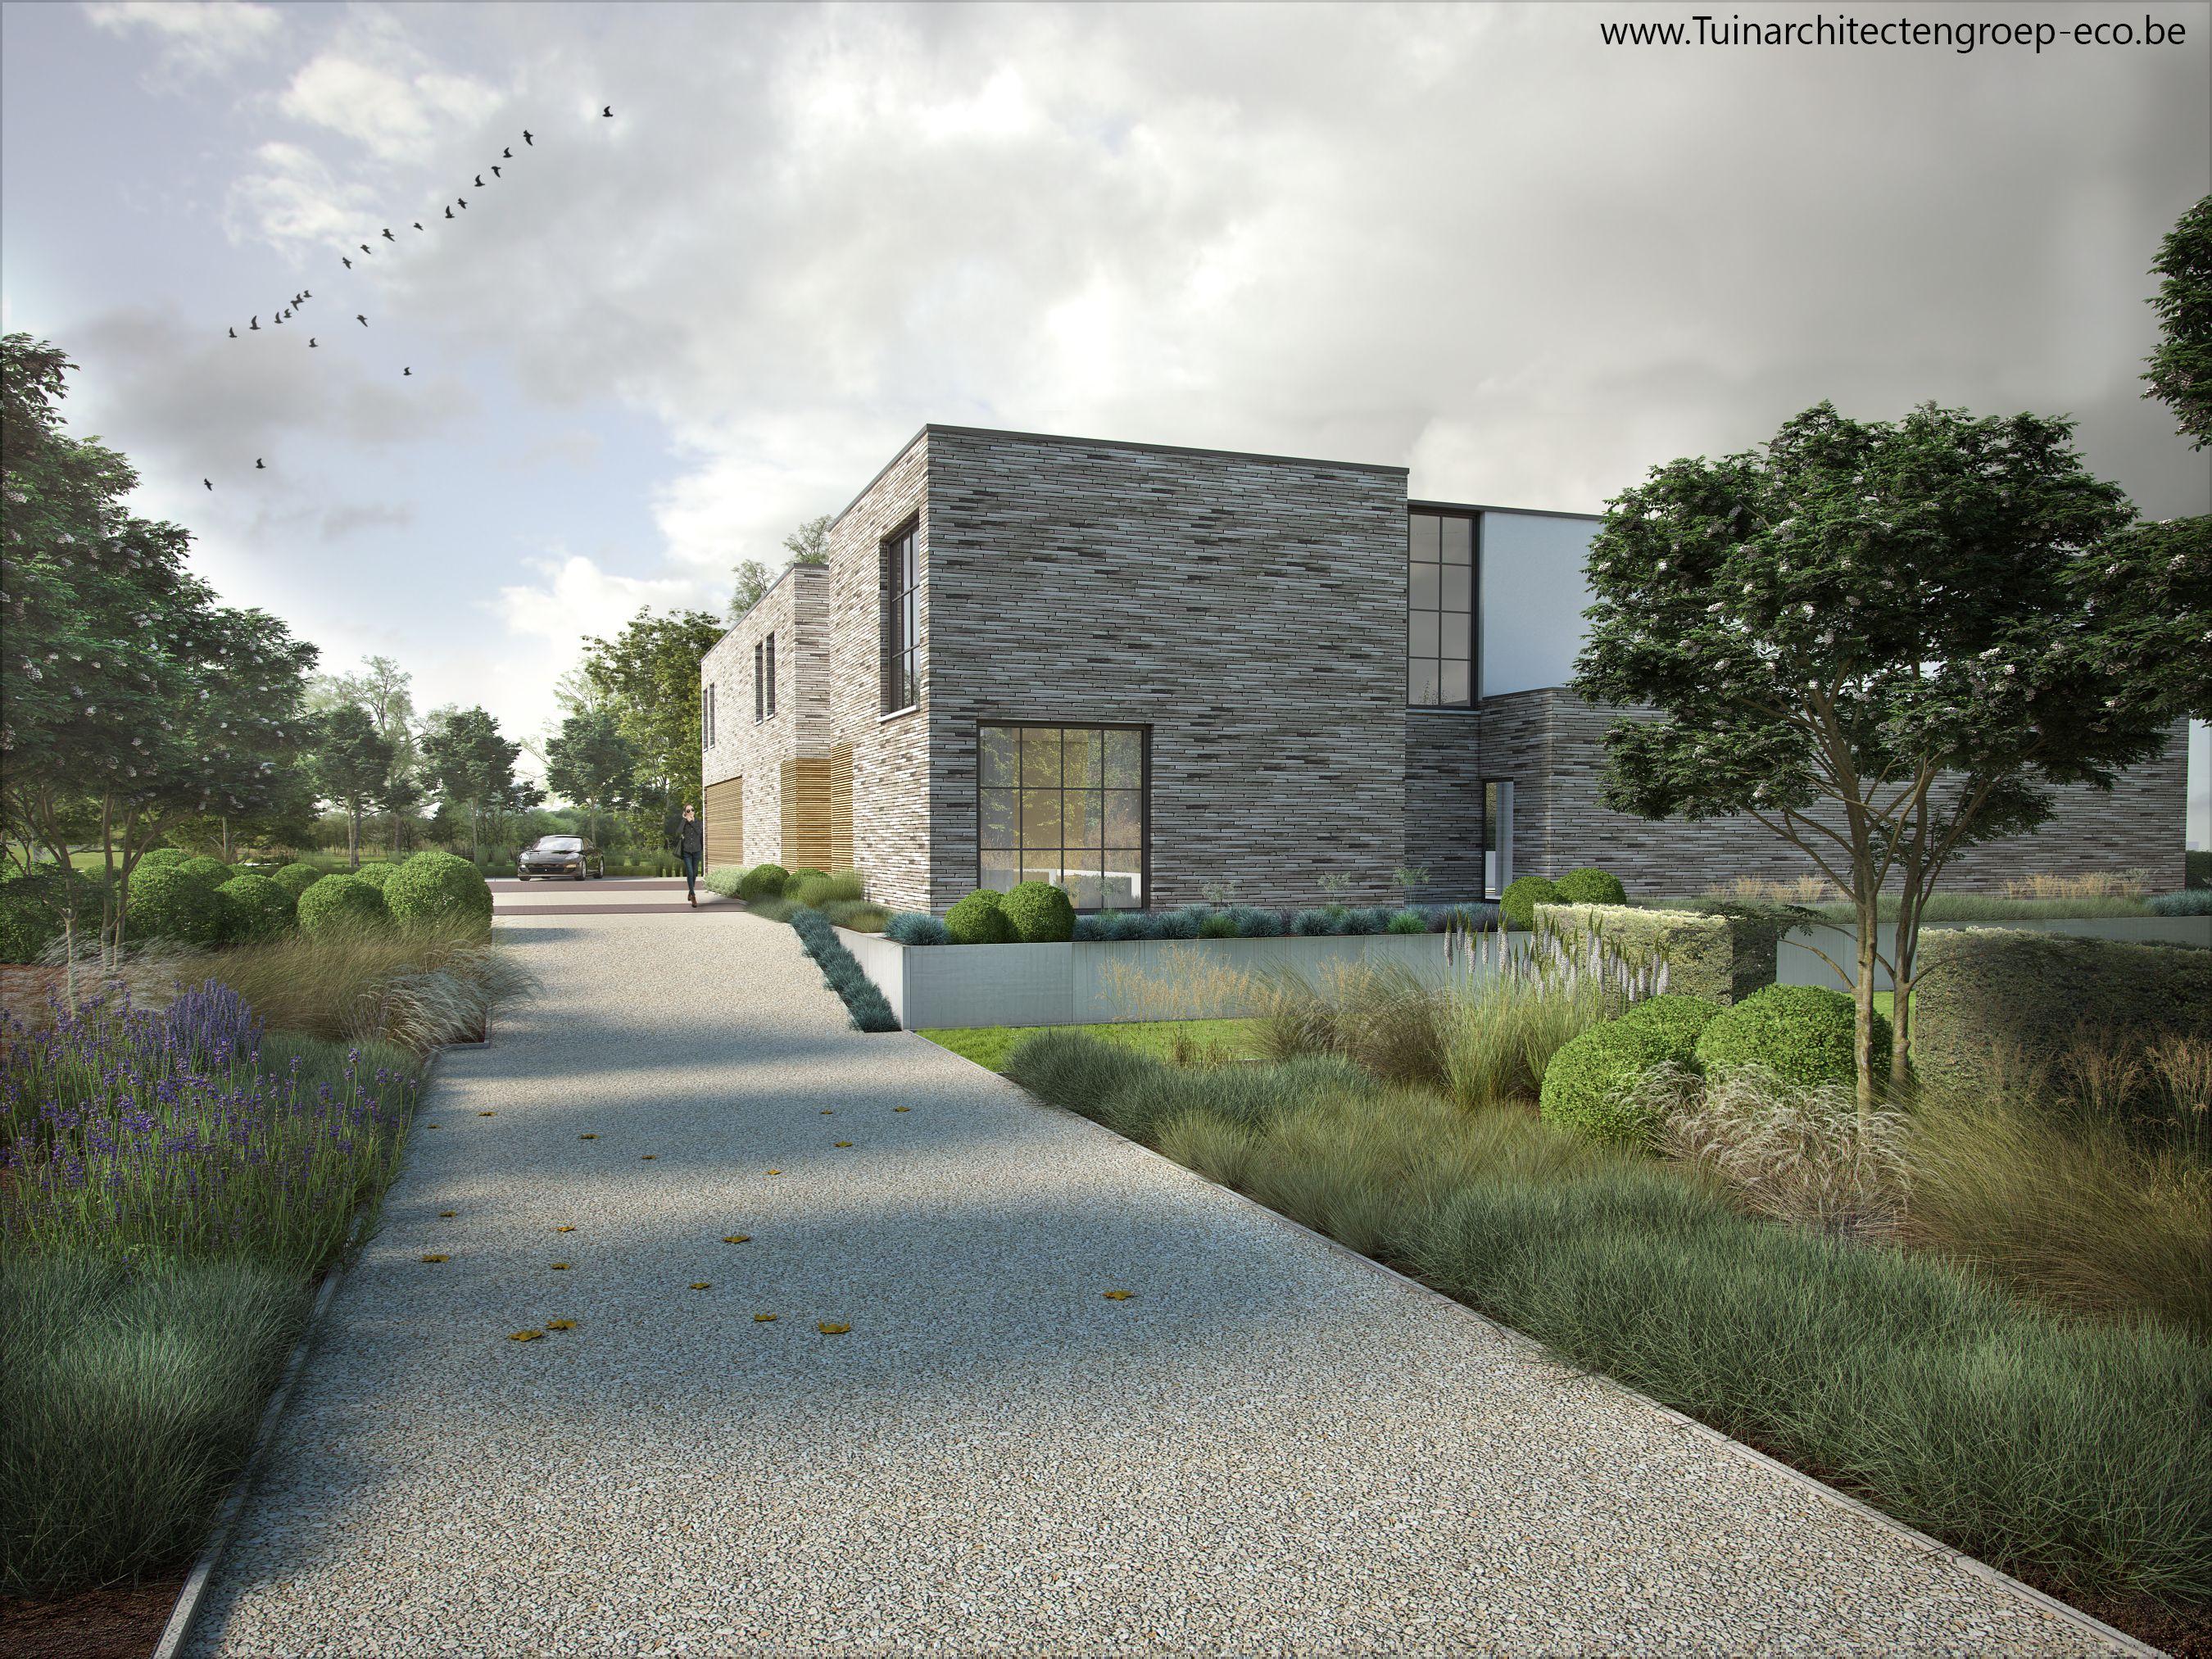 Tuinontwerp timothy cools : tuinarchitectengroep eco moderne tuin en